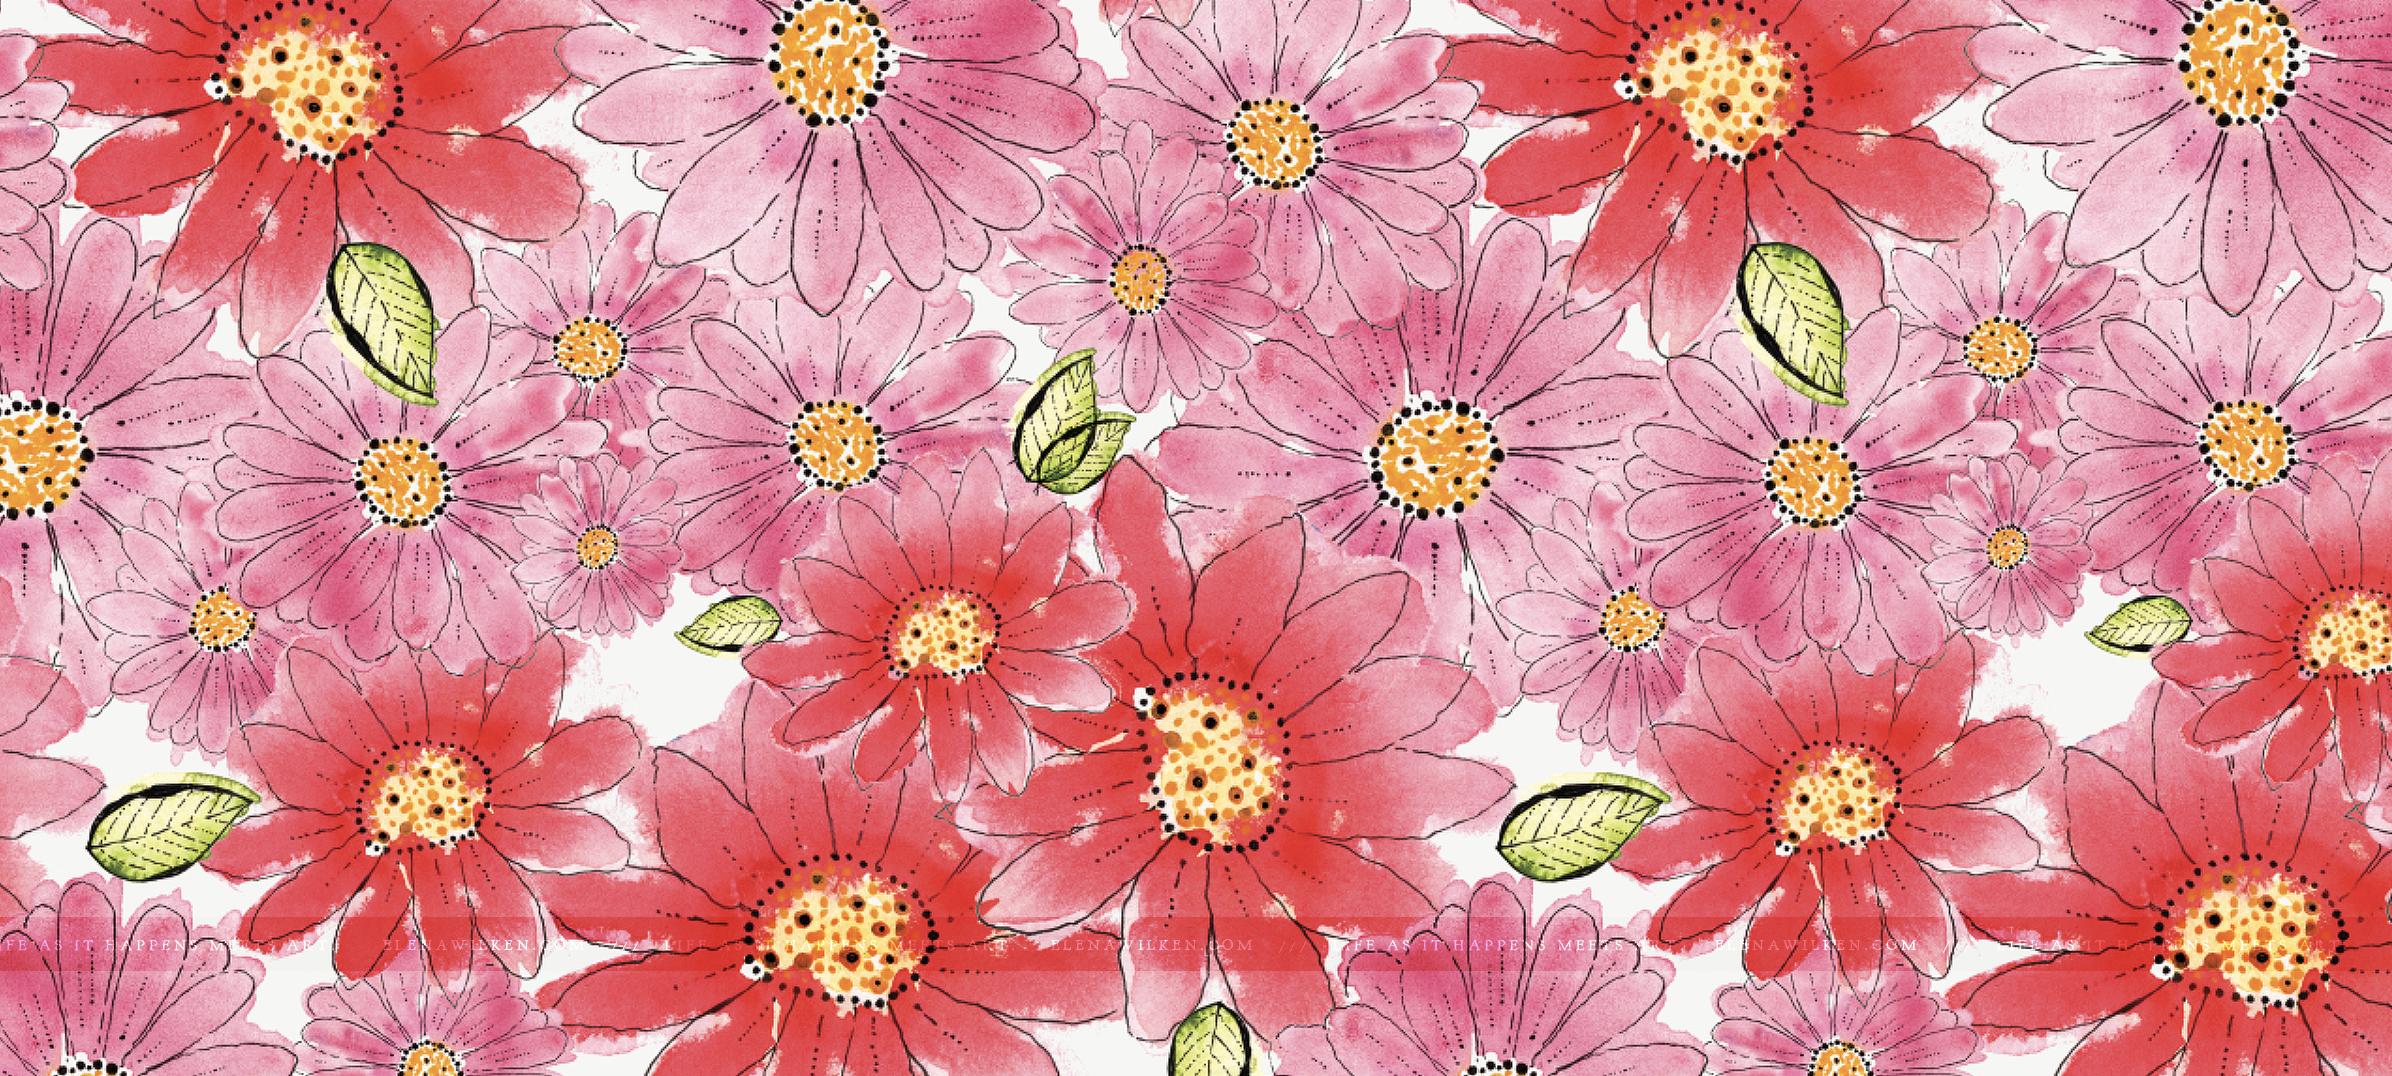 elena-wilken-whimsical-watercolor-fields-surface-pattern-design8.png